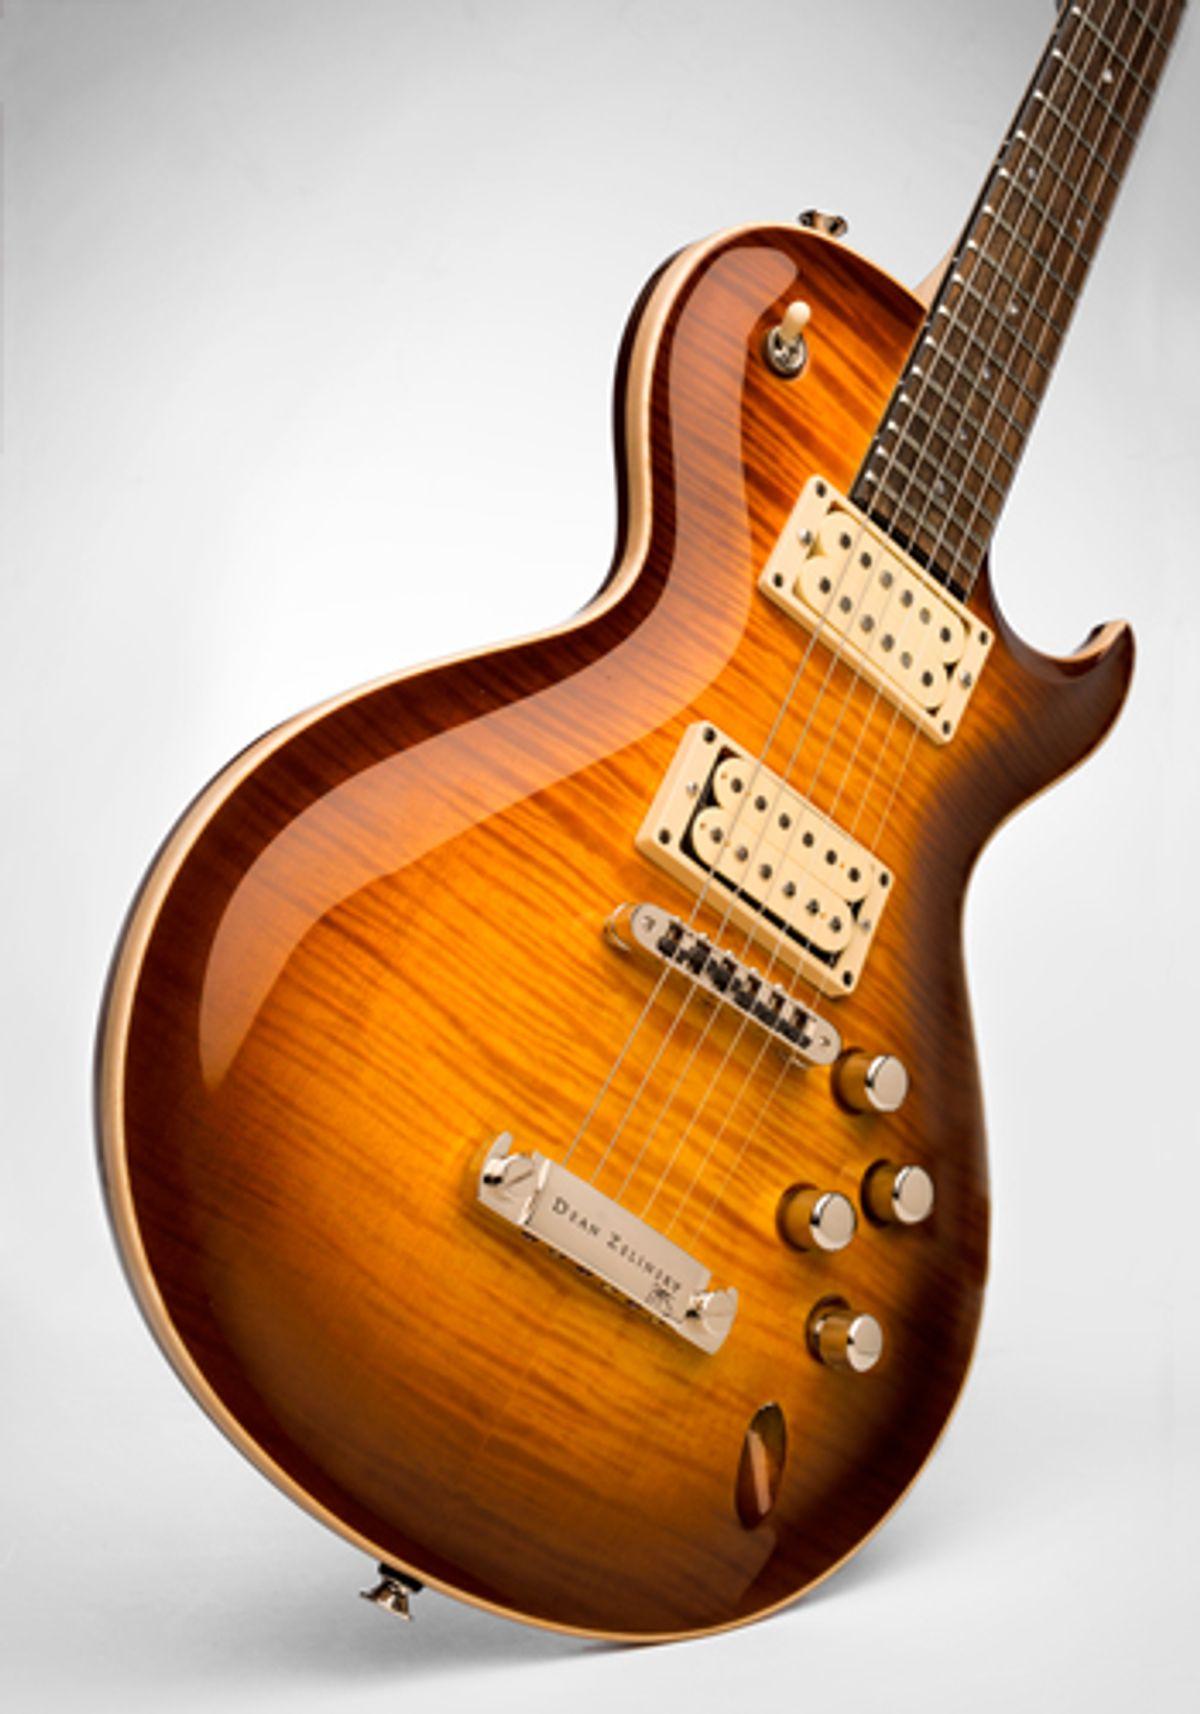 Dean Zelinsky Guitars Introduces the LaVoce